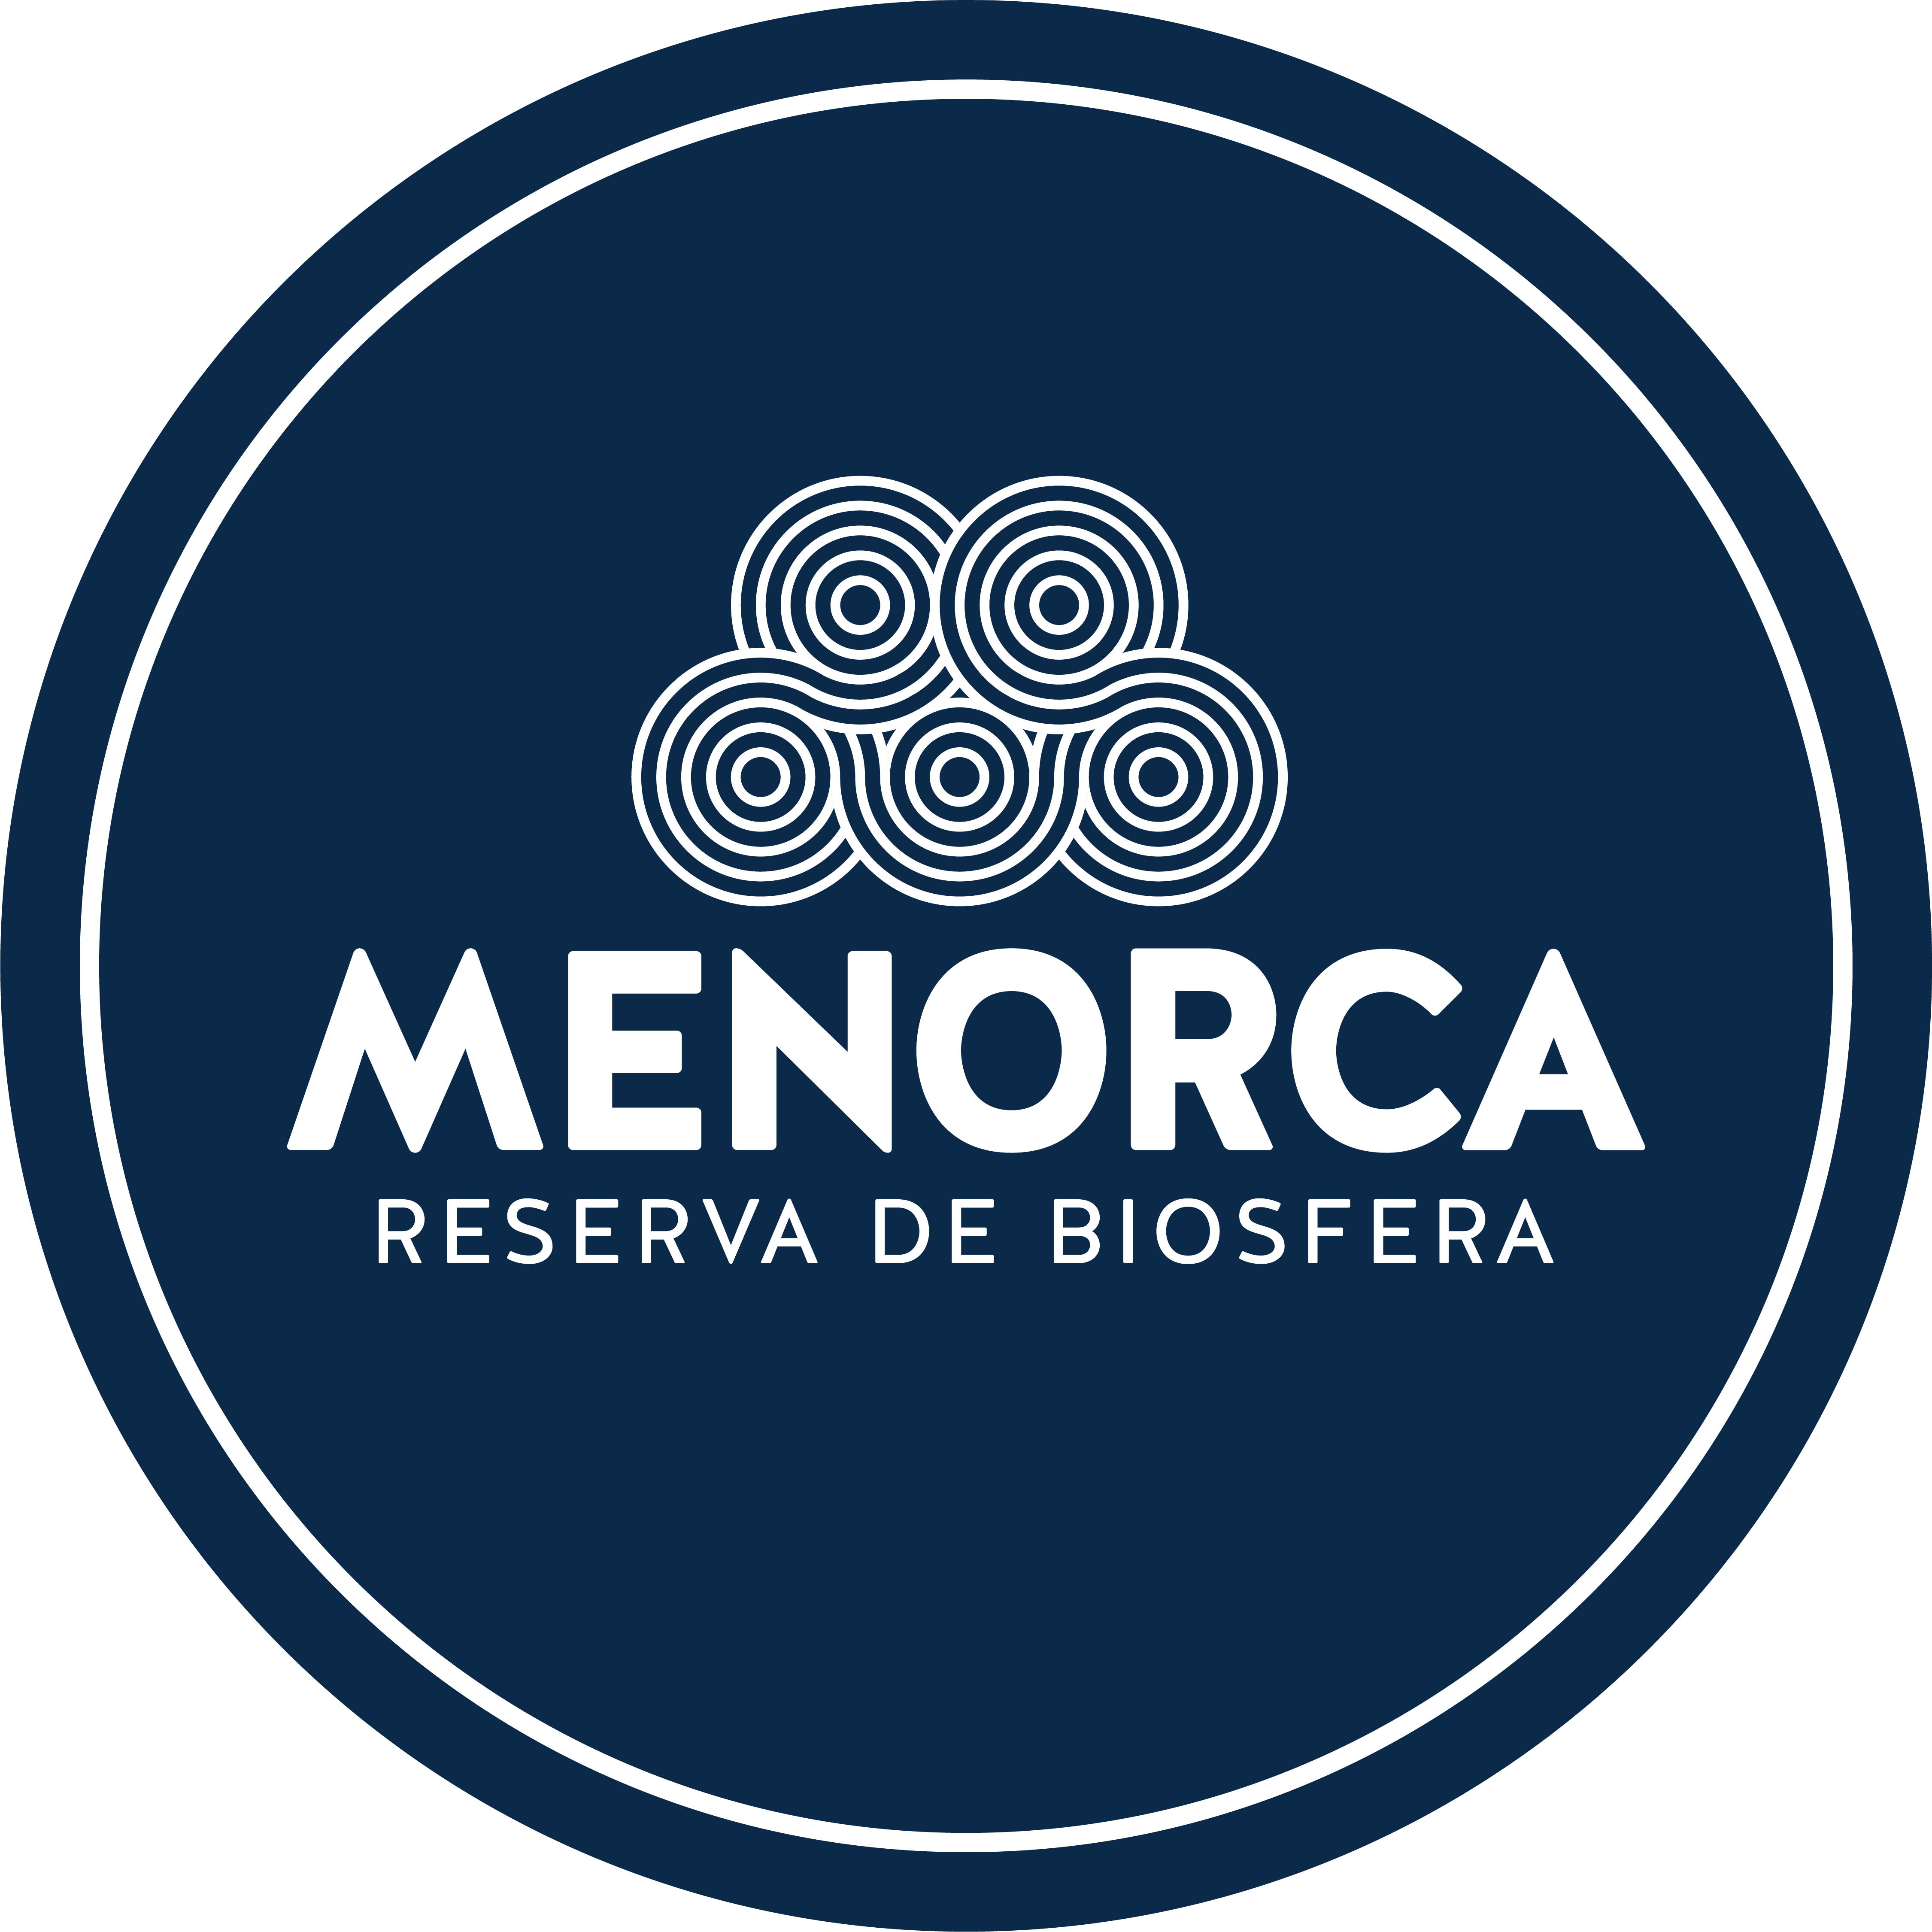 Agencia Reserva Biosfera Menorca